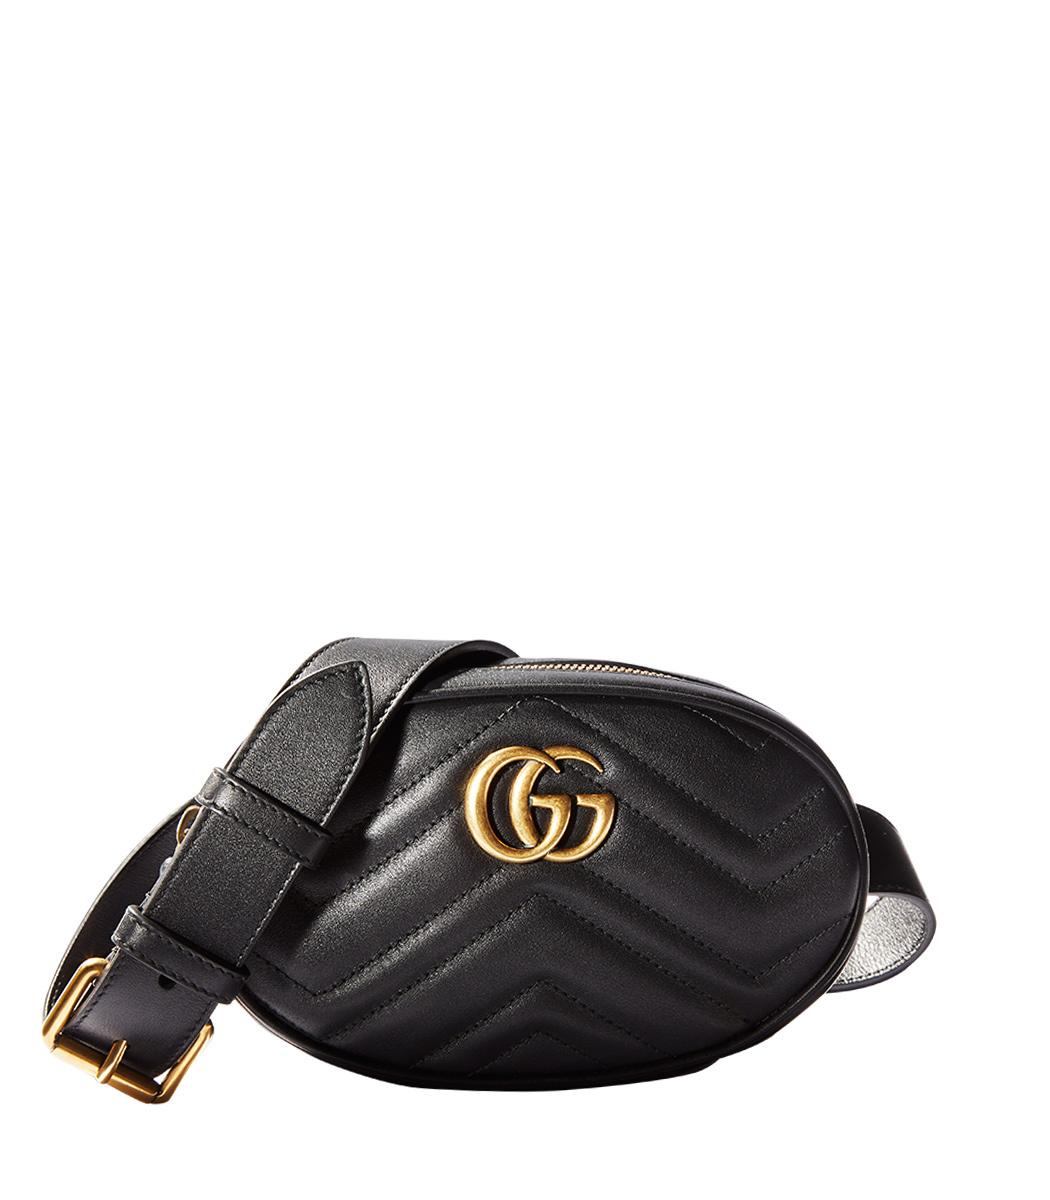 ccb1d6b71da Gg Marmont 2.0 Leather Belt Pack, Black